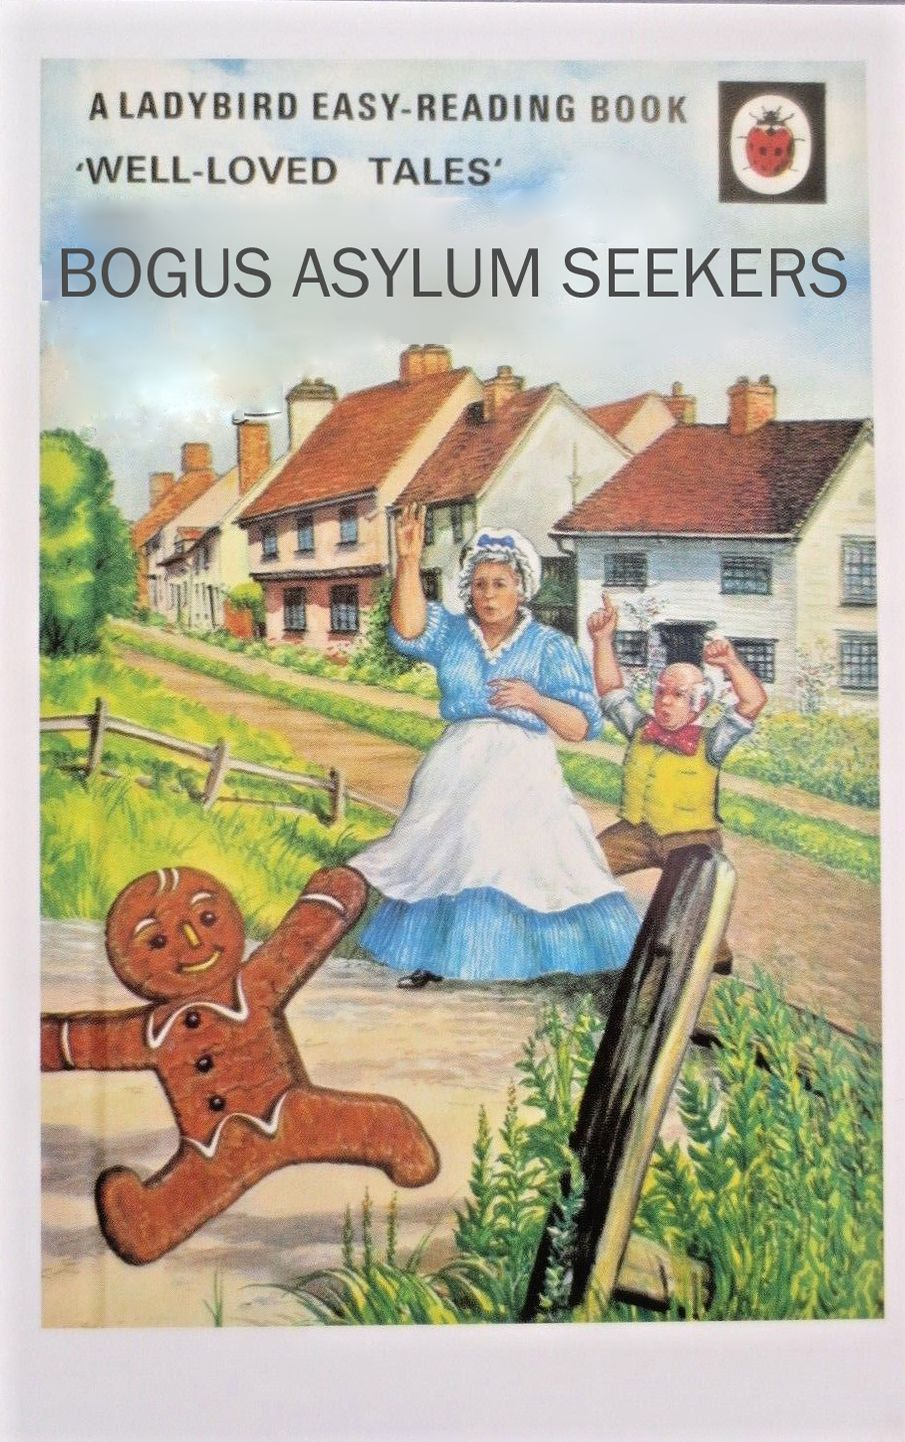 Pin By Chris Glenn On Great Children S Books Ladybird Books